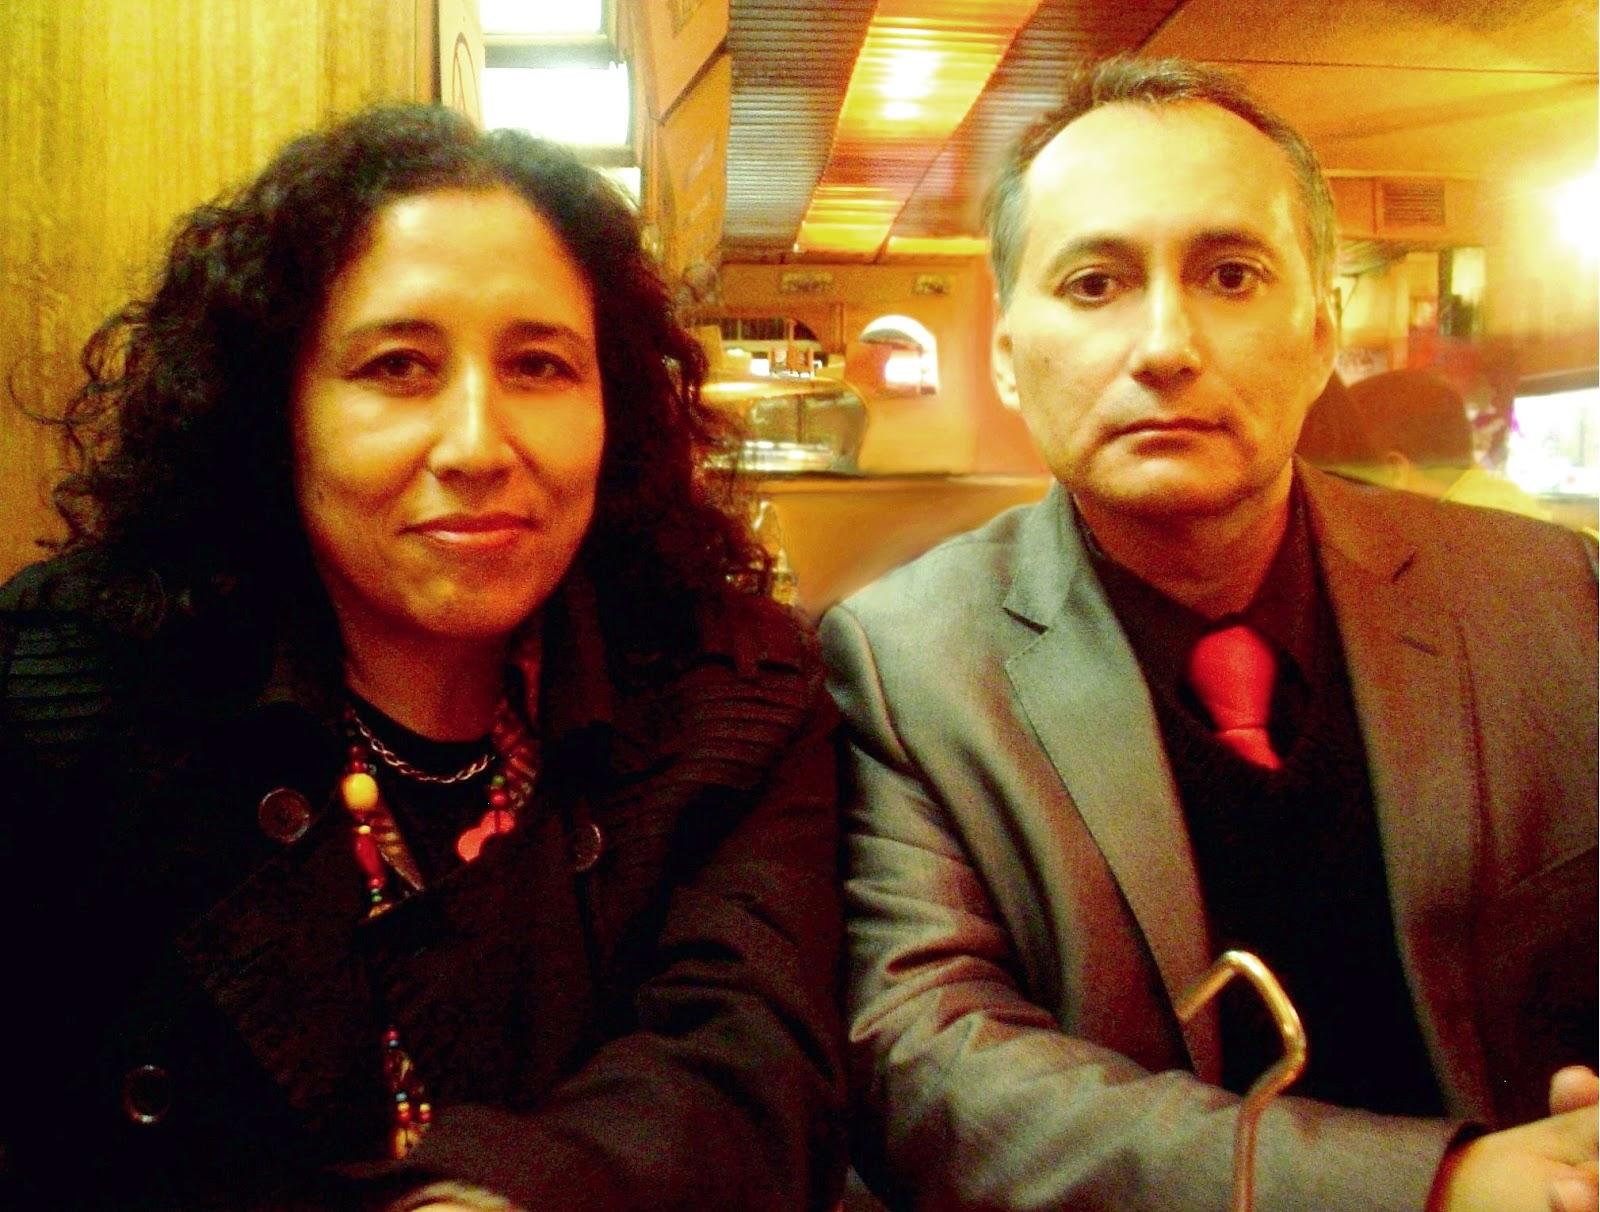 http://2.bp.blogspot.com/--jGU478ZIFk/T8RFS6vryhI/AAAAAAAAE9Y/tVEpmpi-aus/s1600/Adolfo++V%C3%A1squez++y+Rosi+L%C3%B3pez+_+Sinfon%C3%ADas+para+adolescentes+Lic.+Vale+2011_70+_17.jpeg